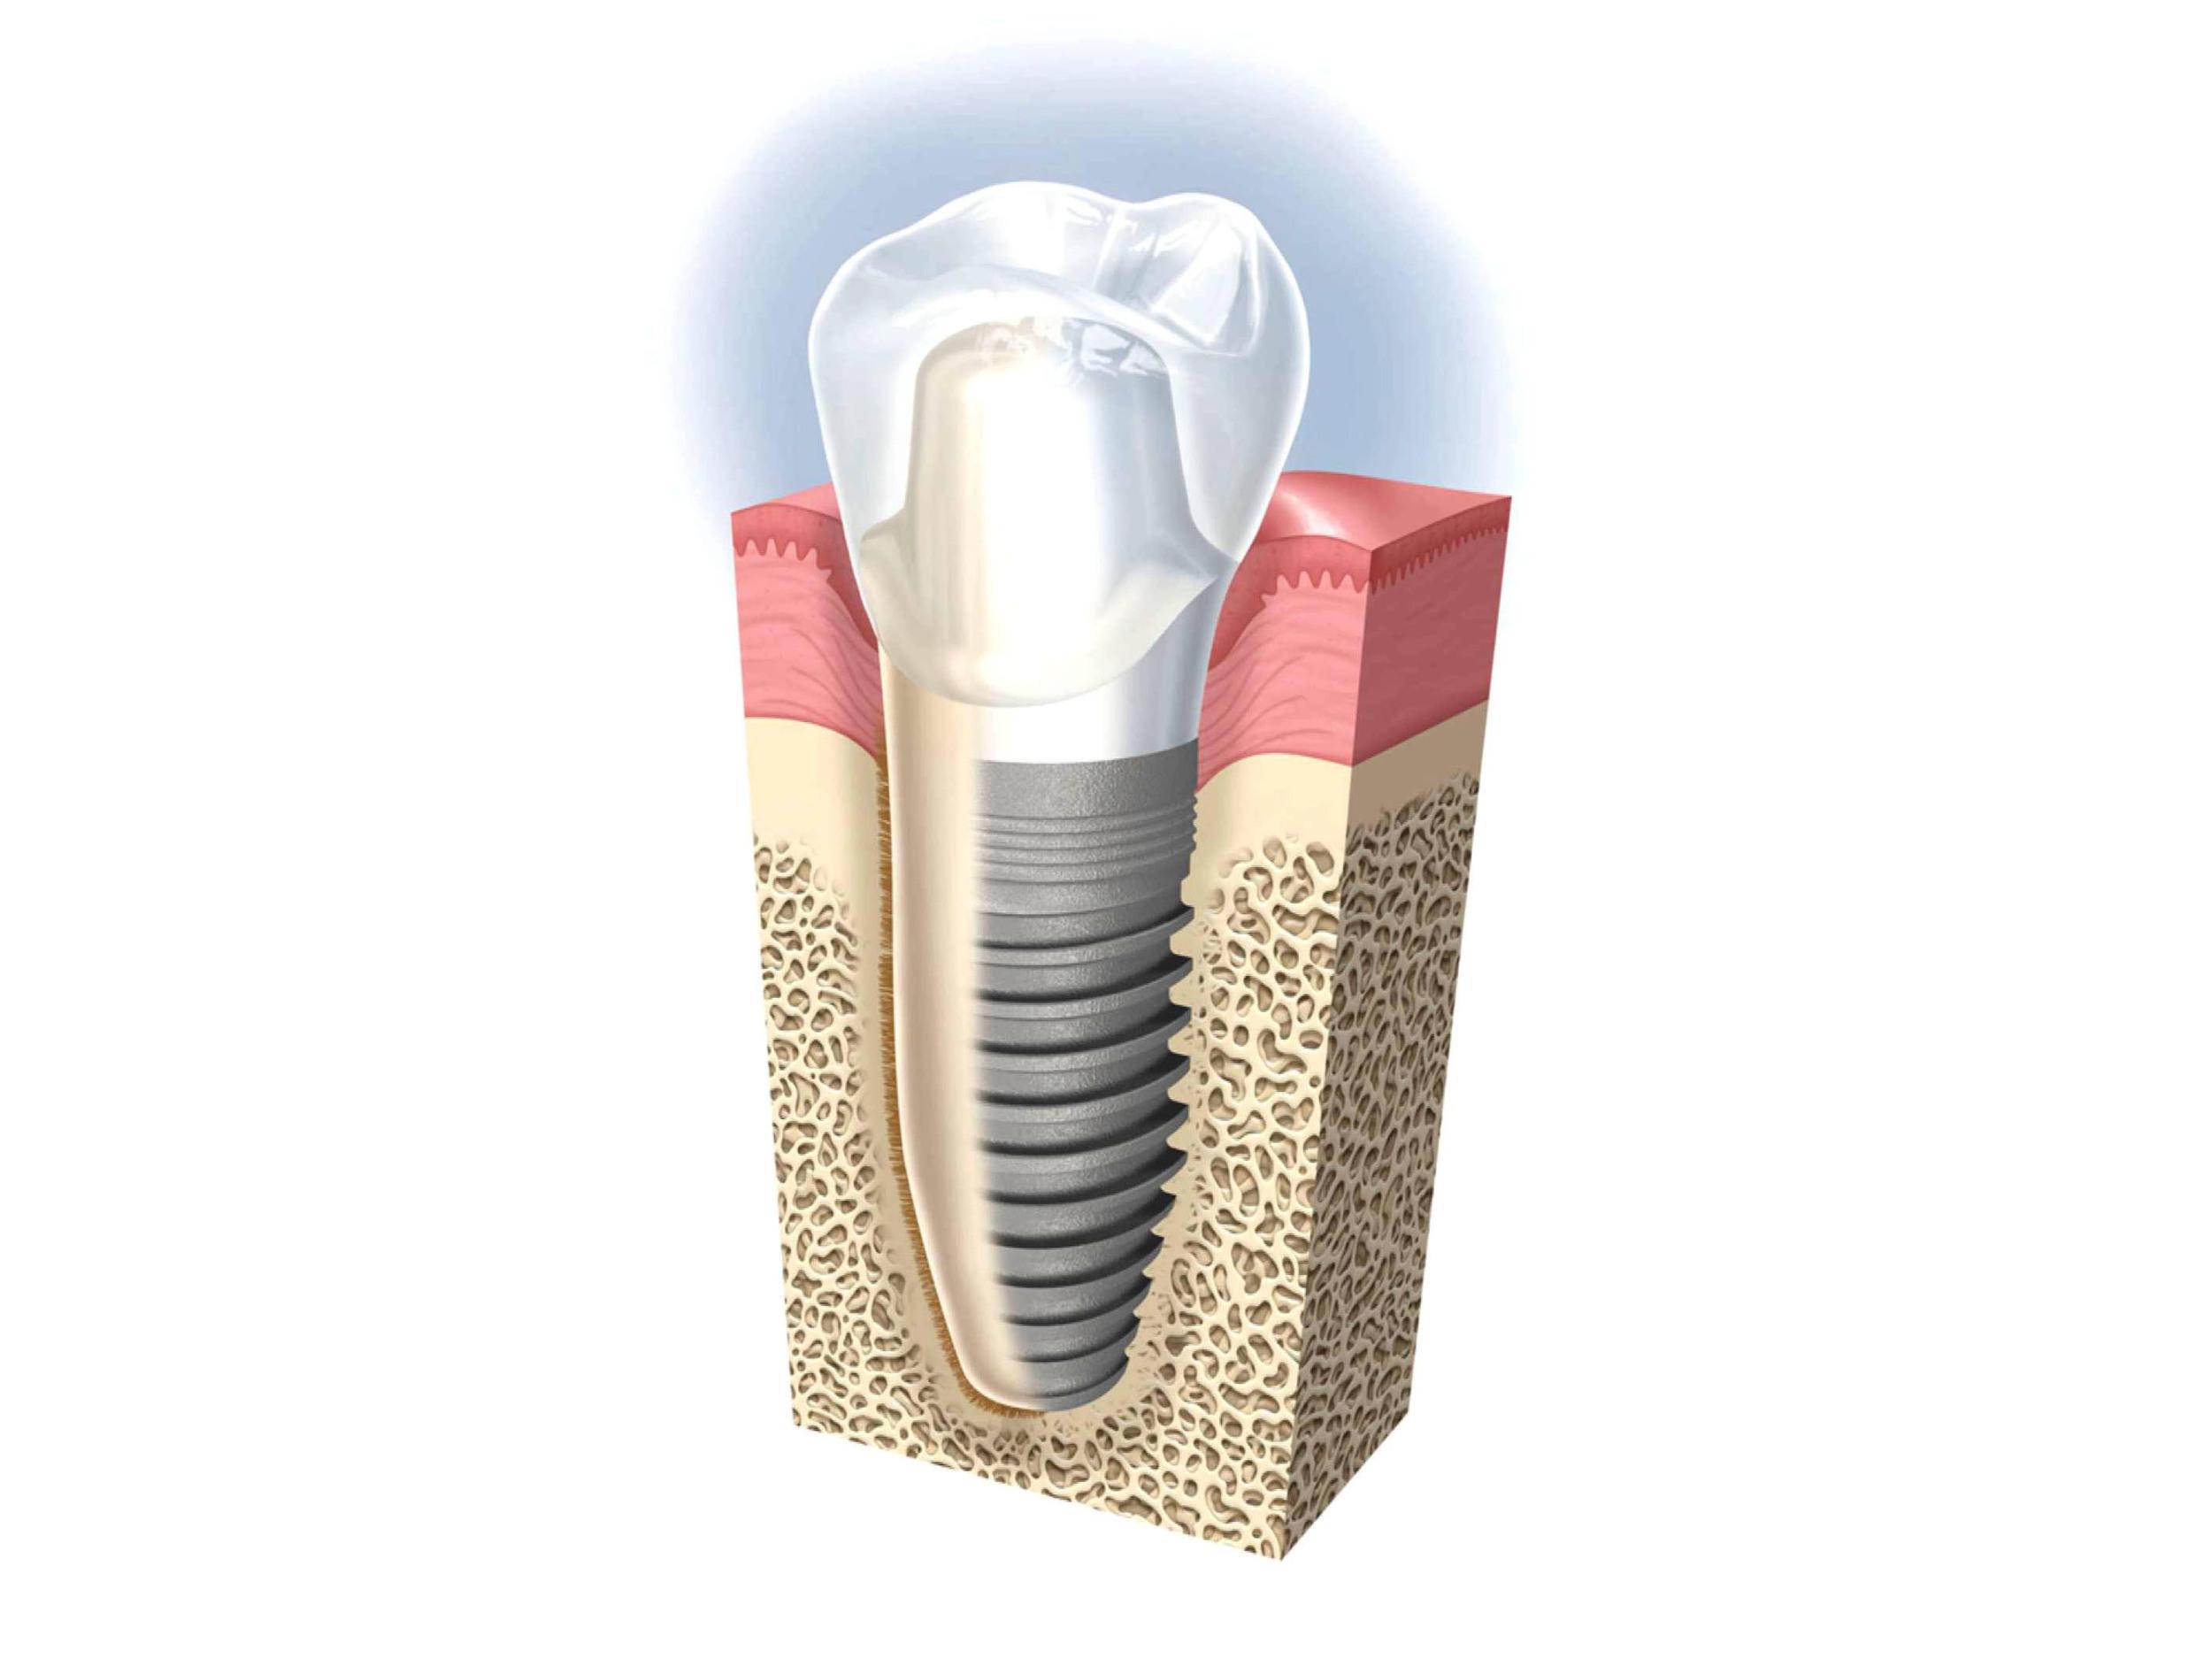 dentalimplant2.jpg